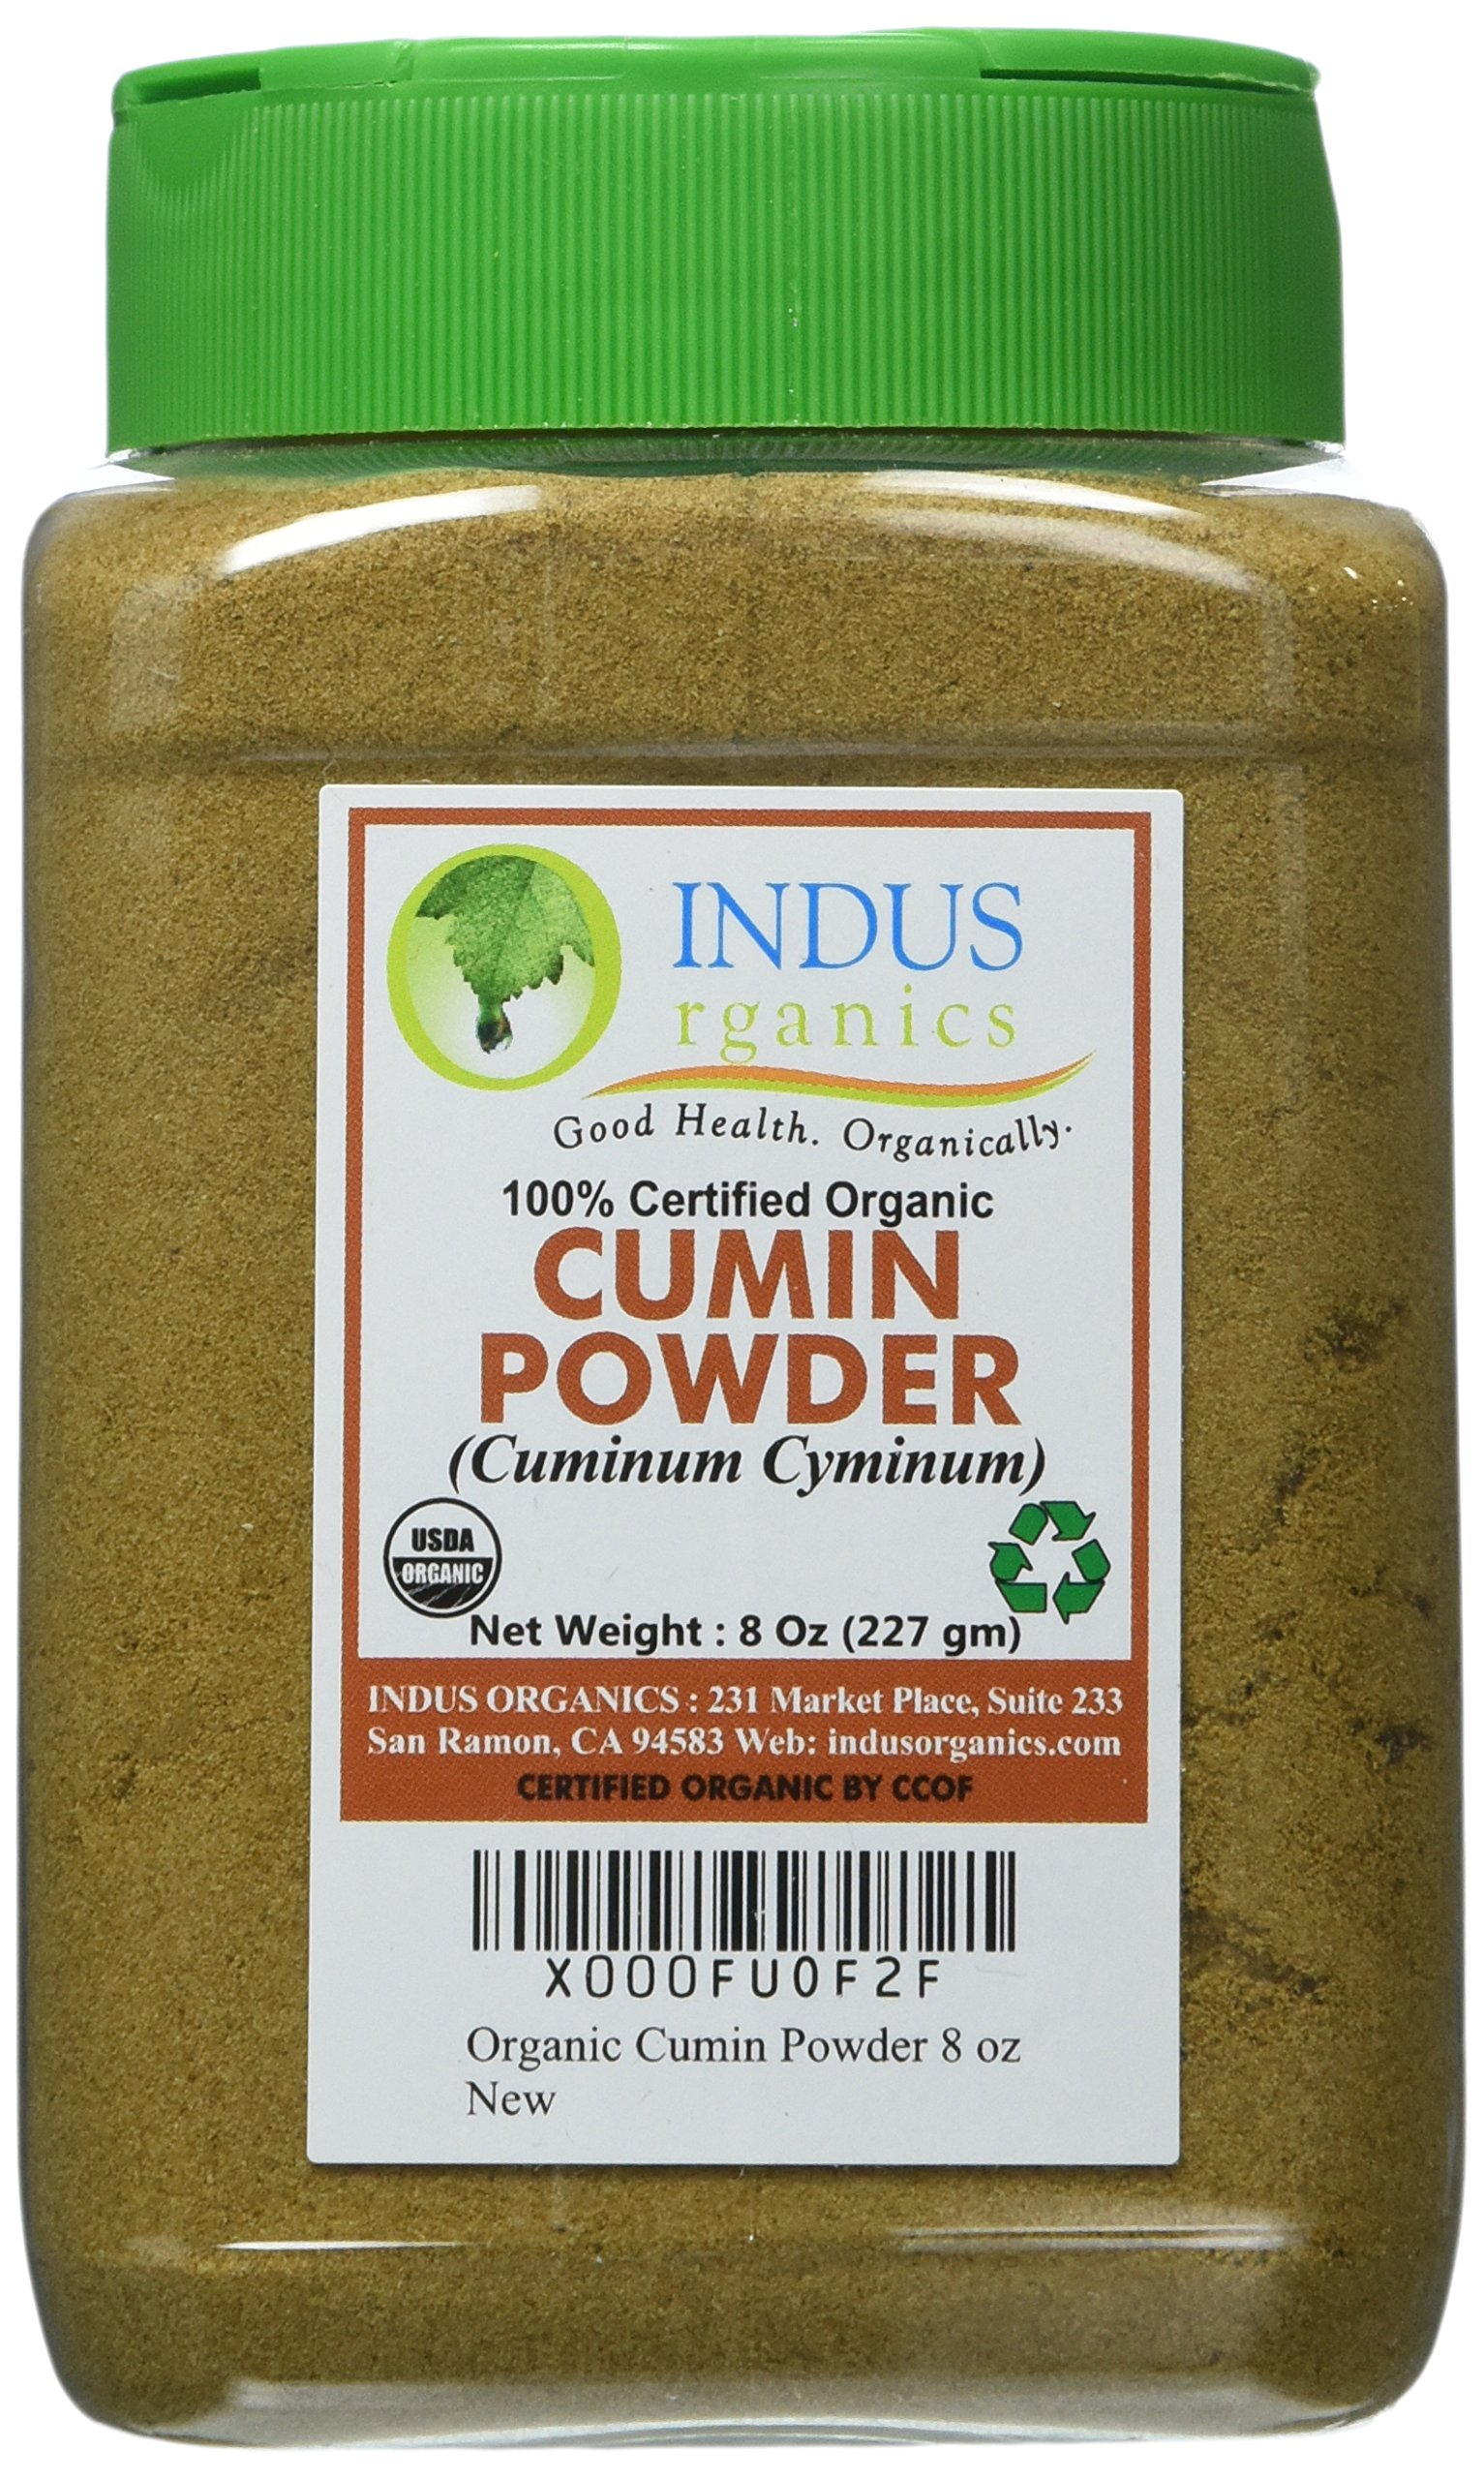 Indus Organics Cumin Seeds Powder, 8 Oz Jar, Premium Grade, High Purity, Freshly Packed